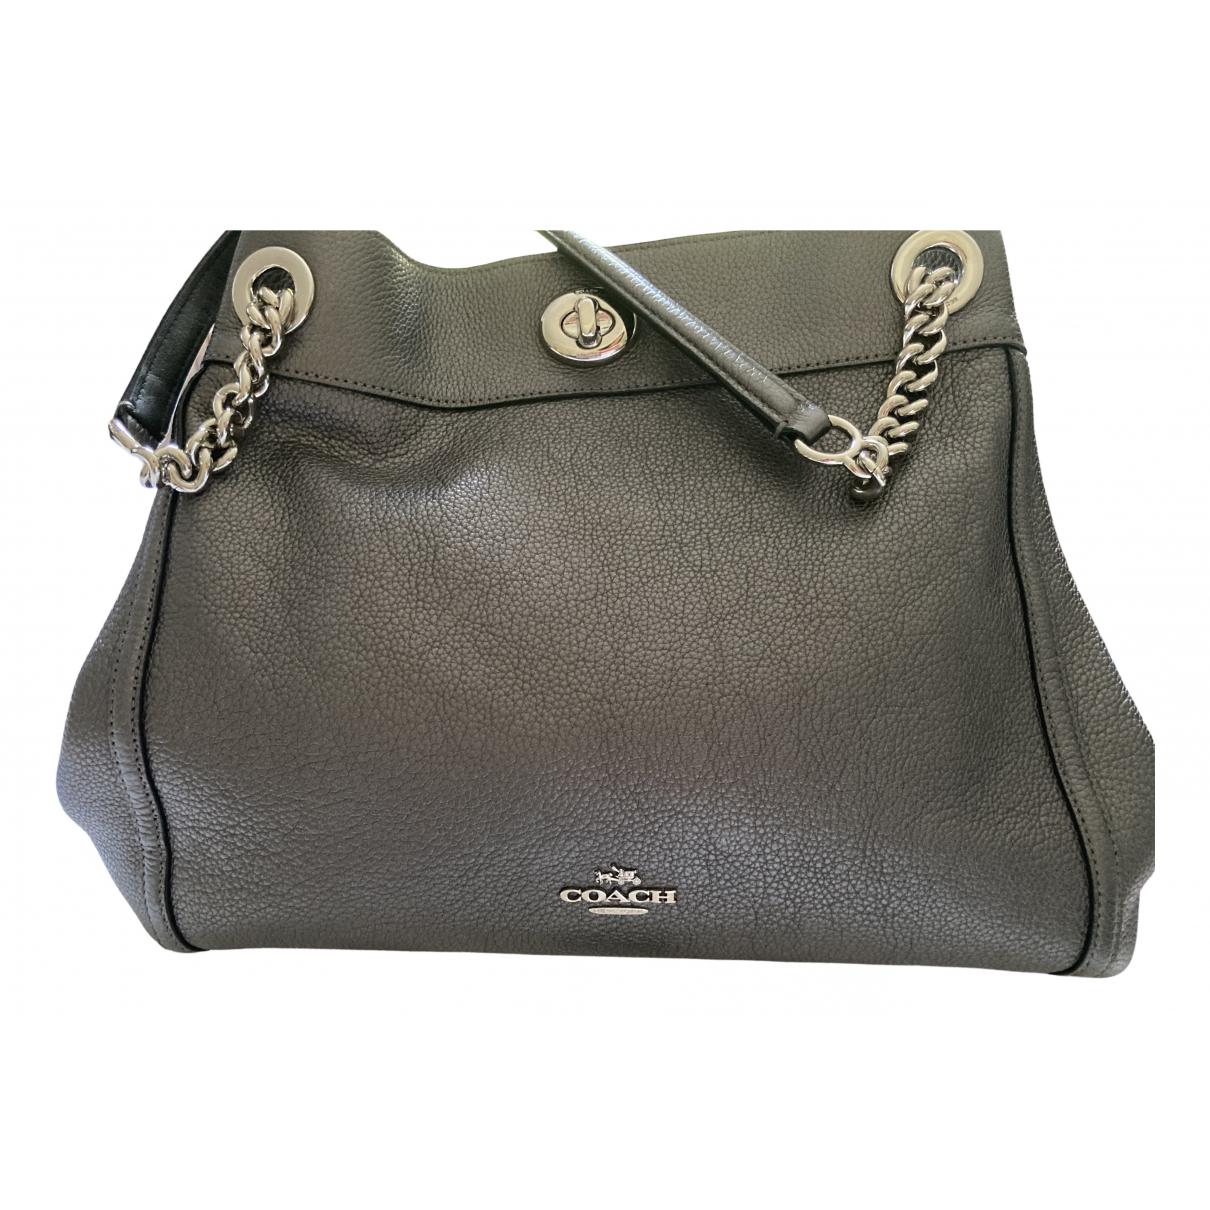 Coach Edie Anthracite Leather handbag for Women N